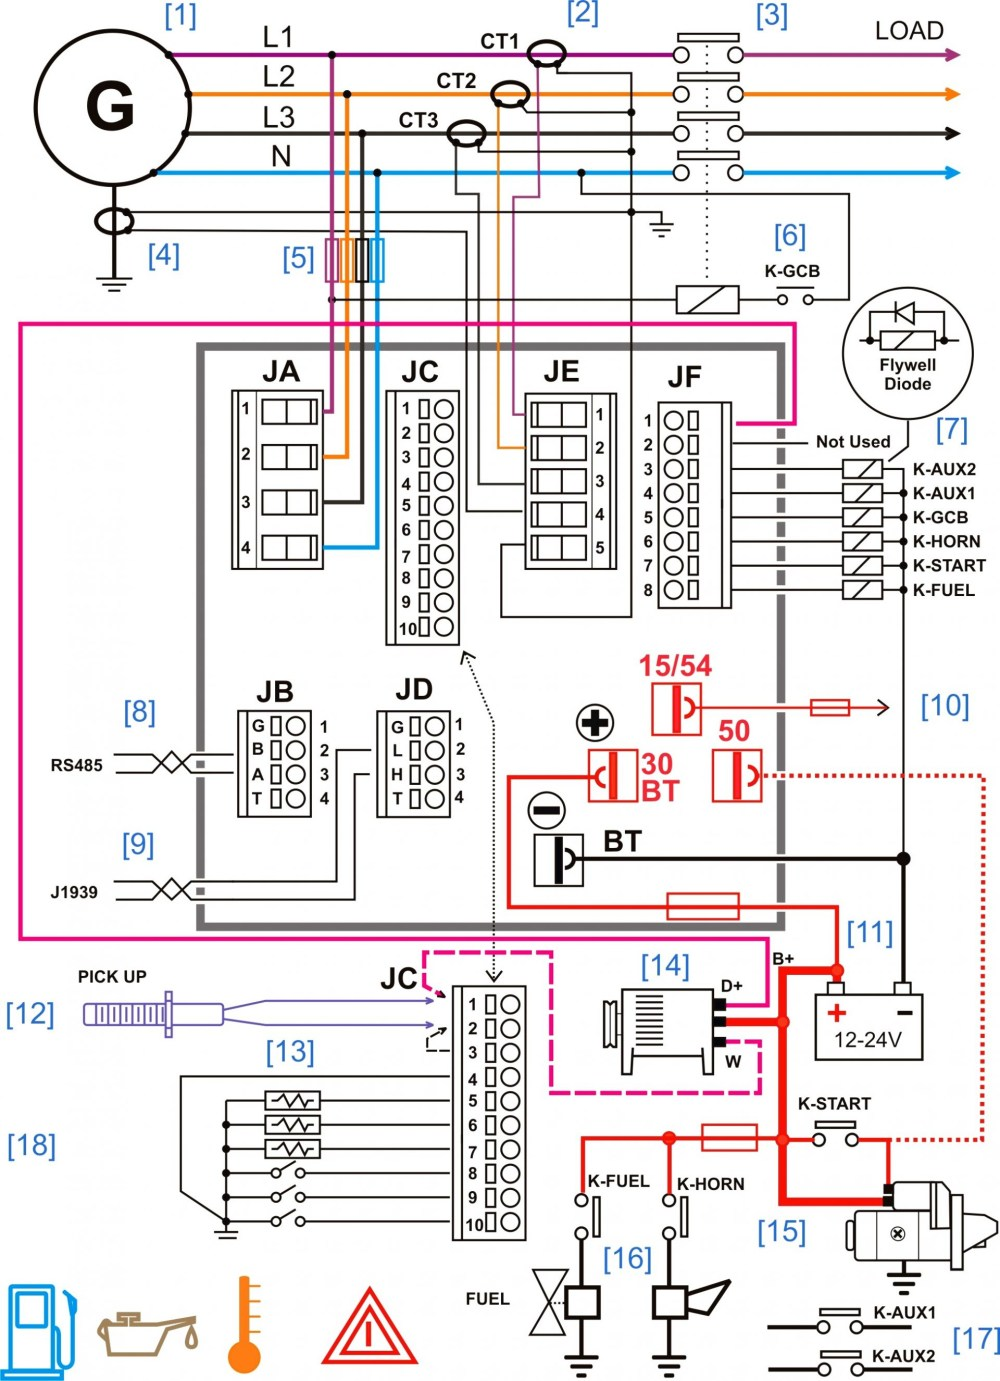 medium resolution of fire alarm wiring diagram gallery wiring diagram sample fire alarm wiring diagram